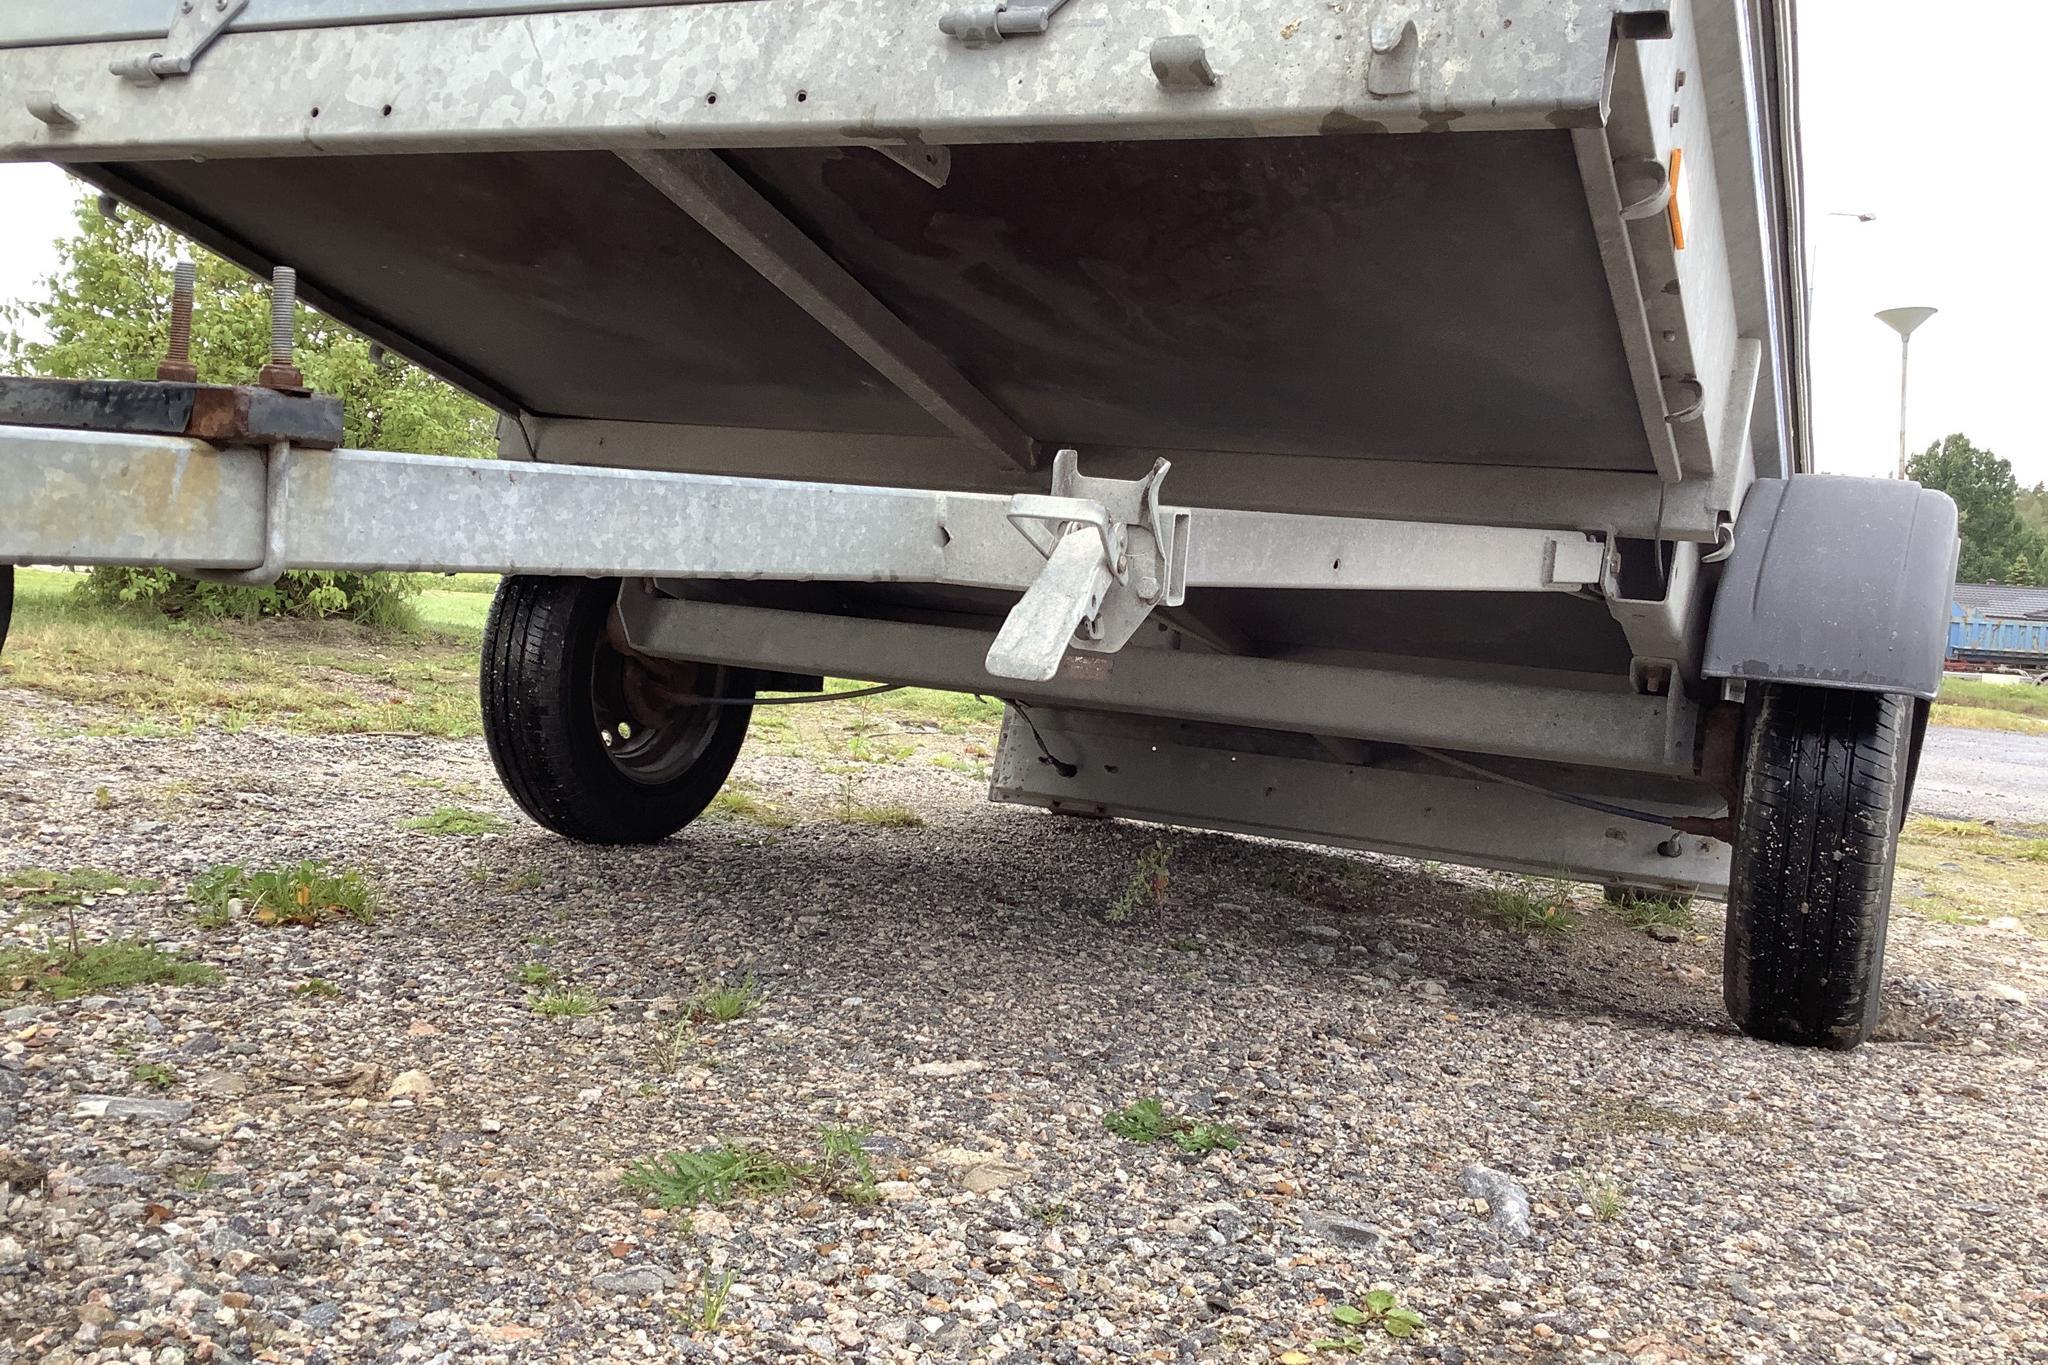 THULE / FOGELSTA R0900 Kåpsläpvagn med tippfunktion - 0 km - gray - 2010